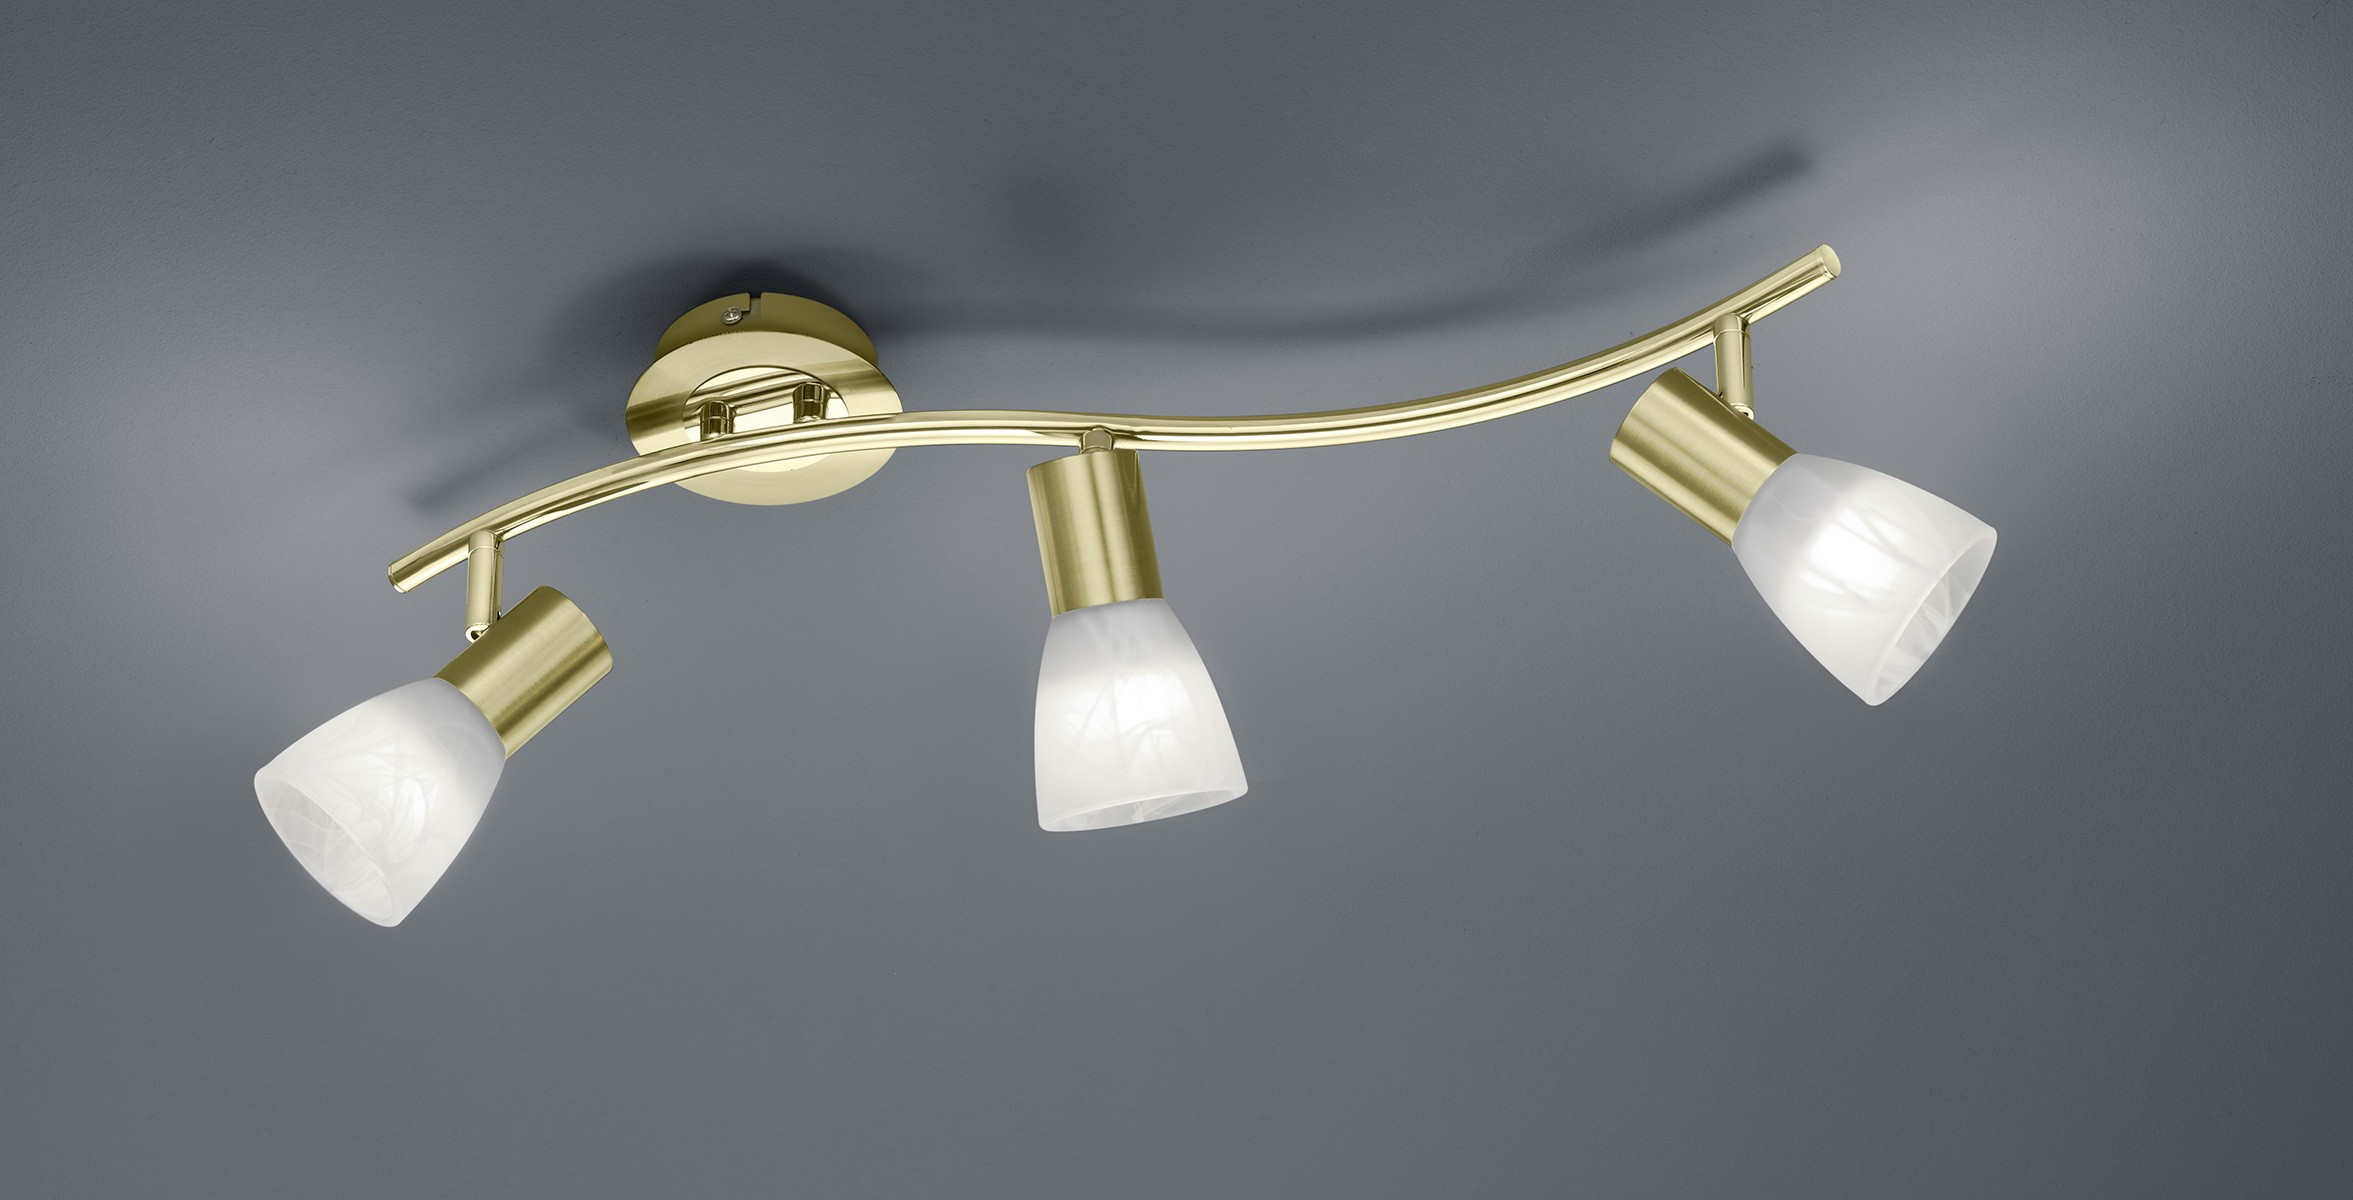 Applique rame moderno lampade da parete foglia rame stile moderno